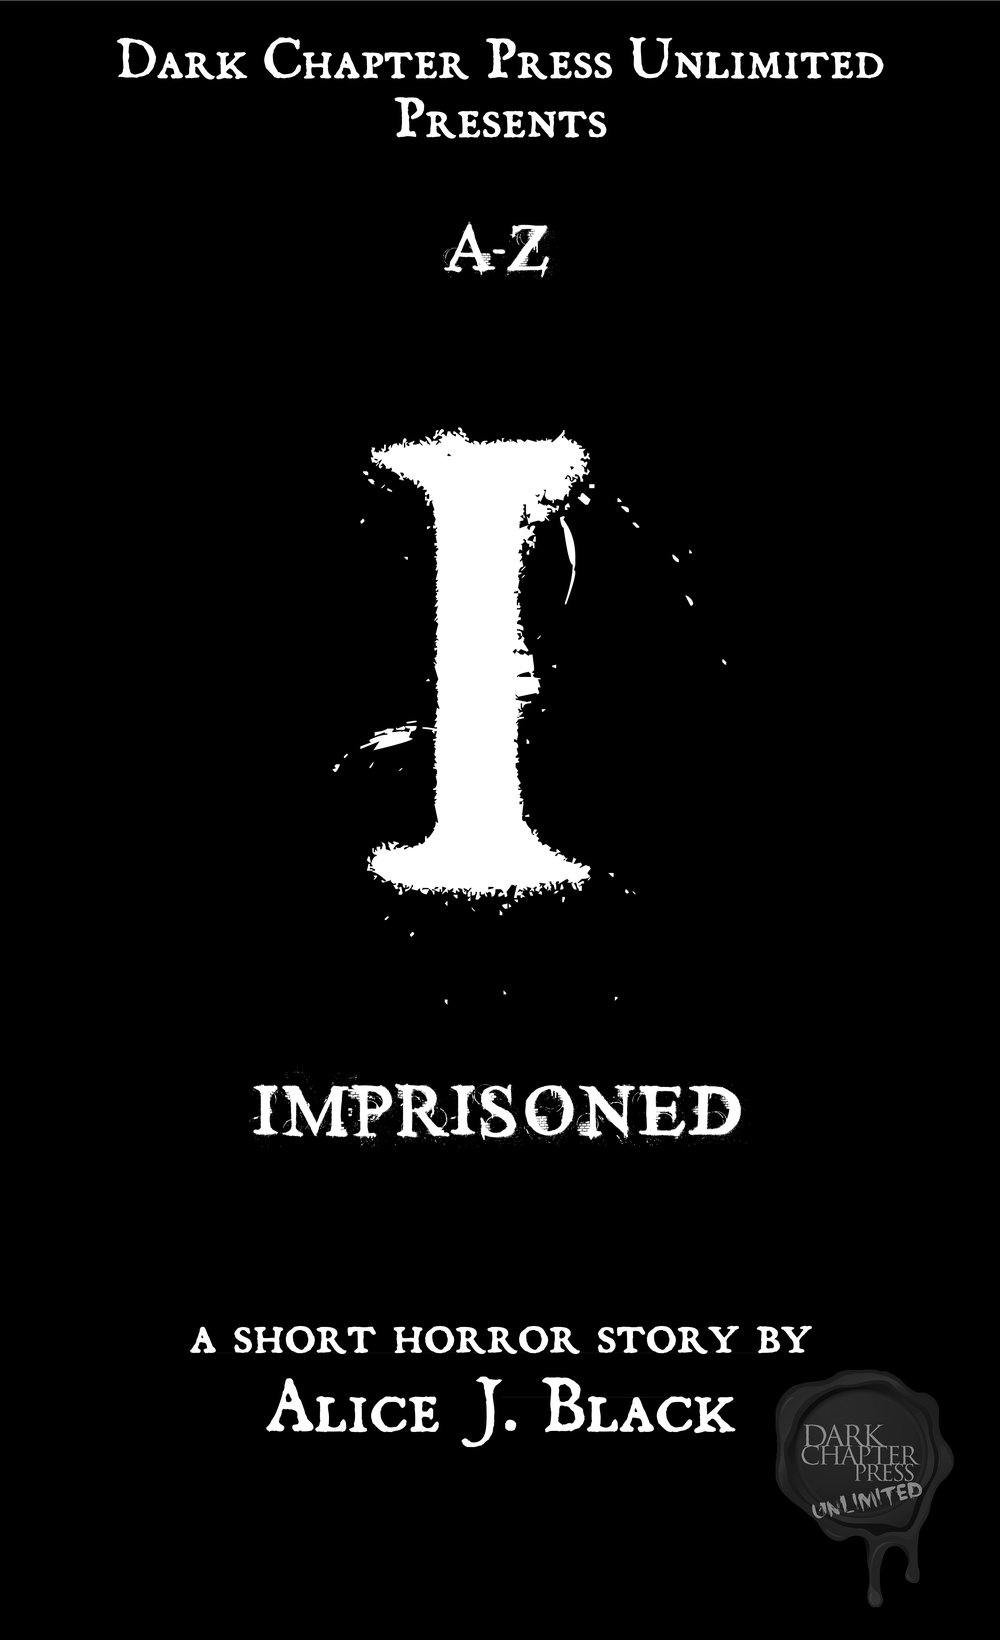 Imprisoned, by Alice J. Black